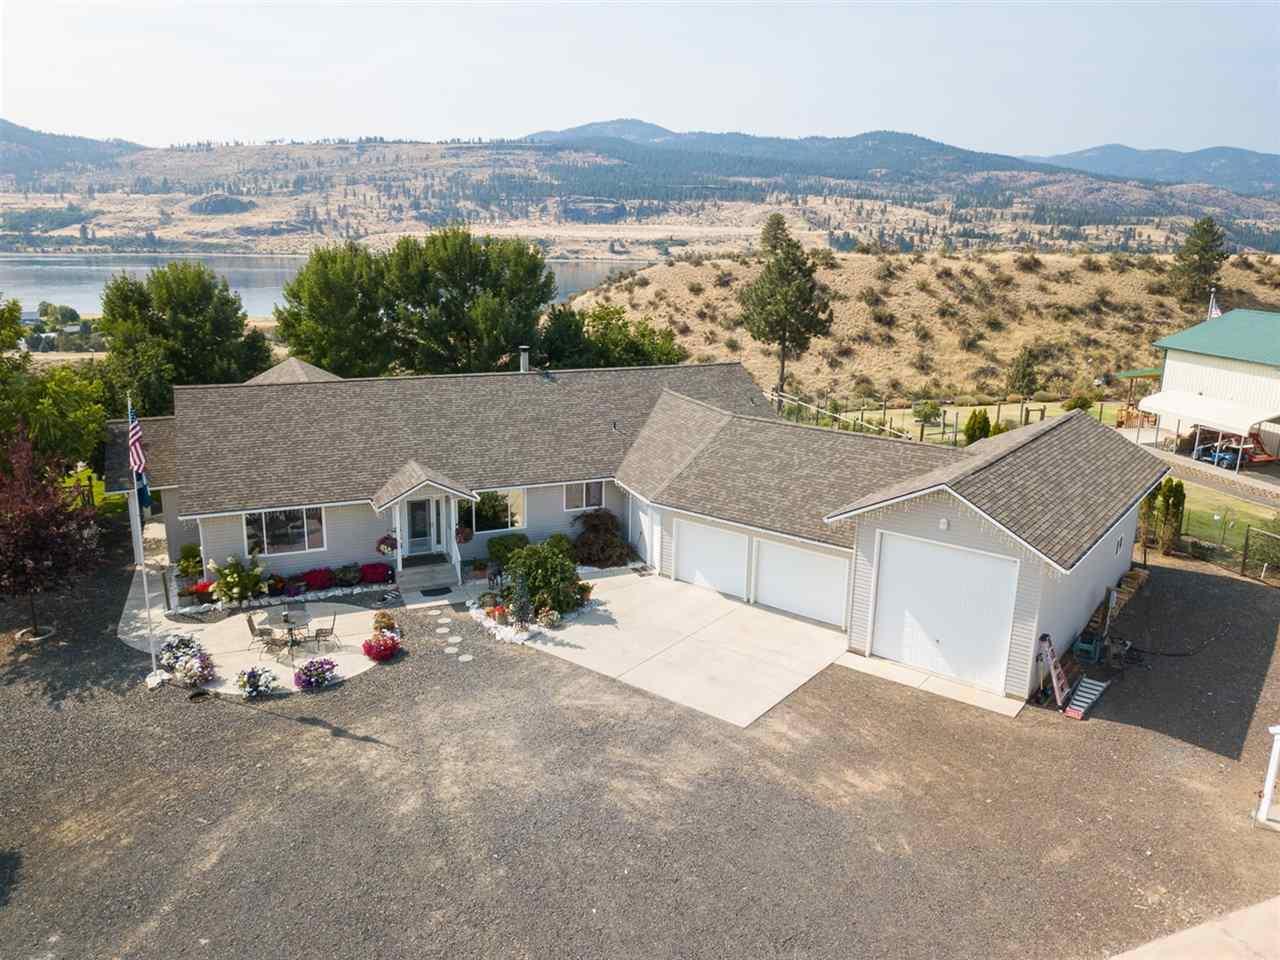 Single Family Home for Sale at 42365 N Doe Drive 42365 N Doe Drive Deer Meadows, Washington 99122 United States